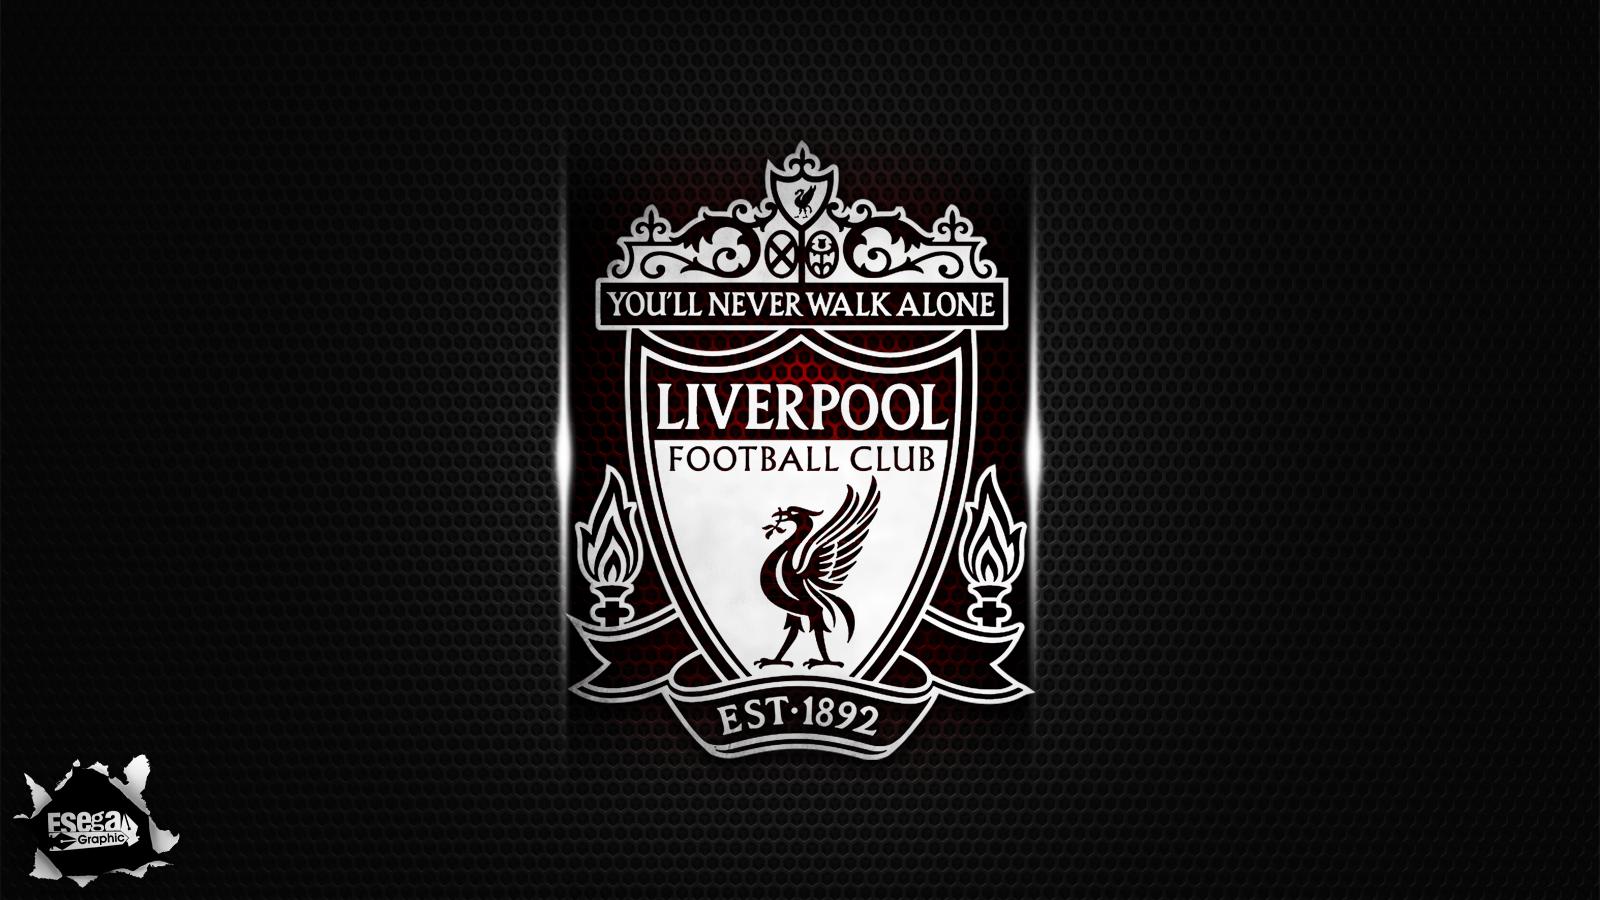 Download Liverpool FC Wallpaper For Mac